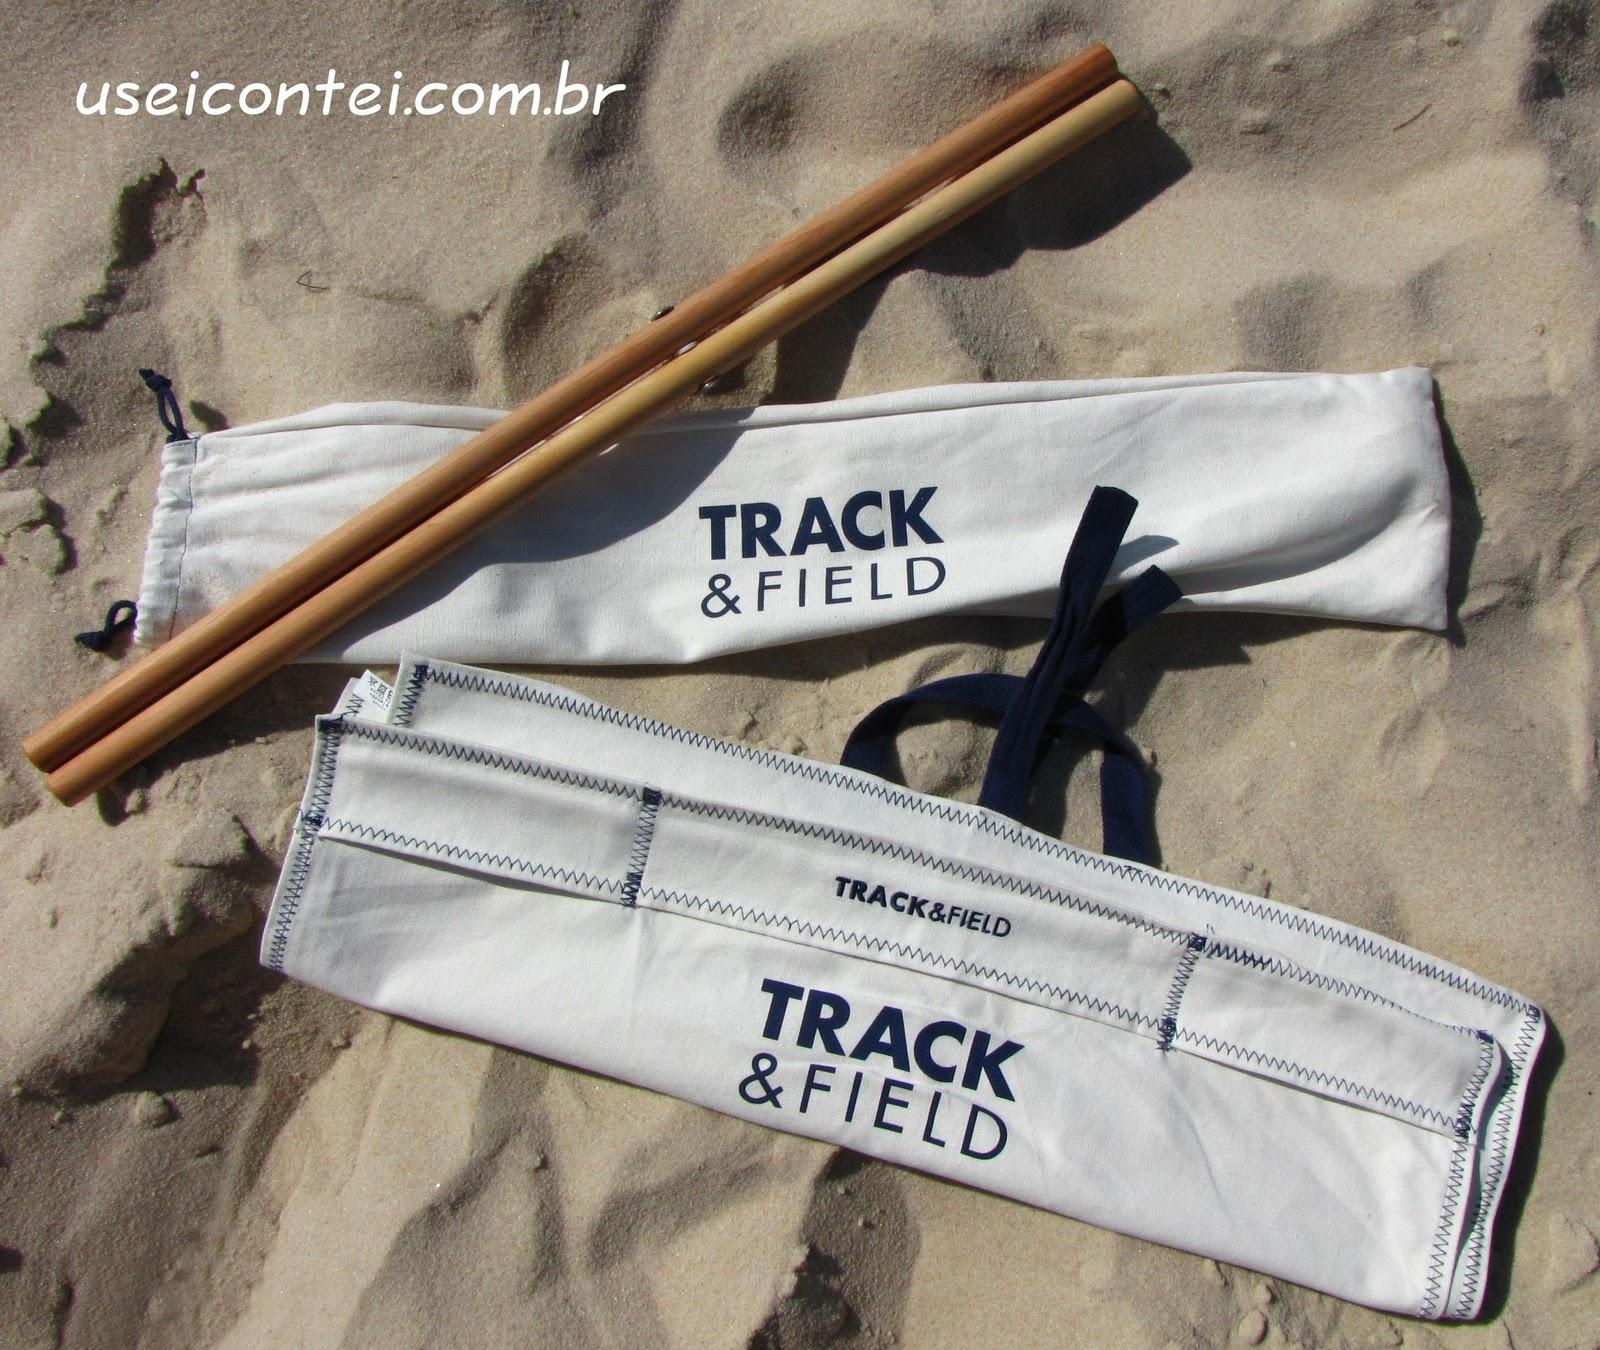 cadeira de praia de praia track field 1.jpg #614B3B 1600x1350